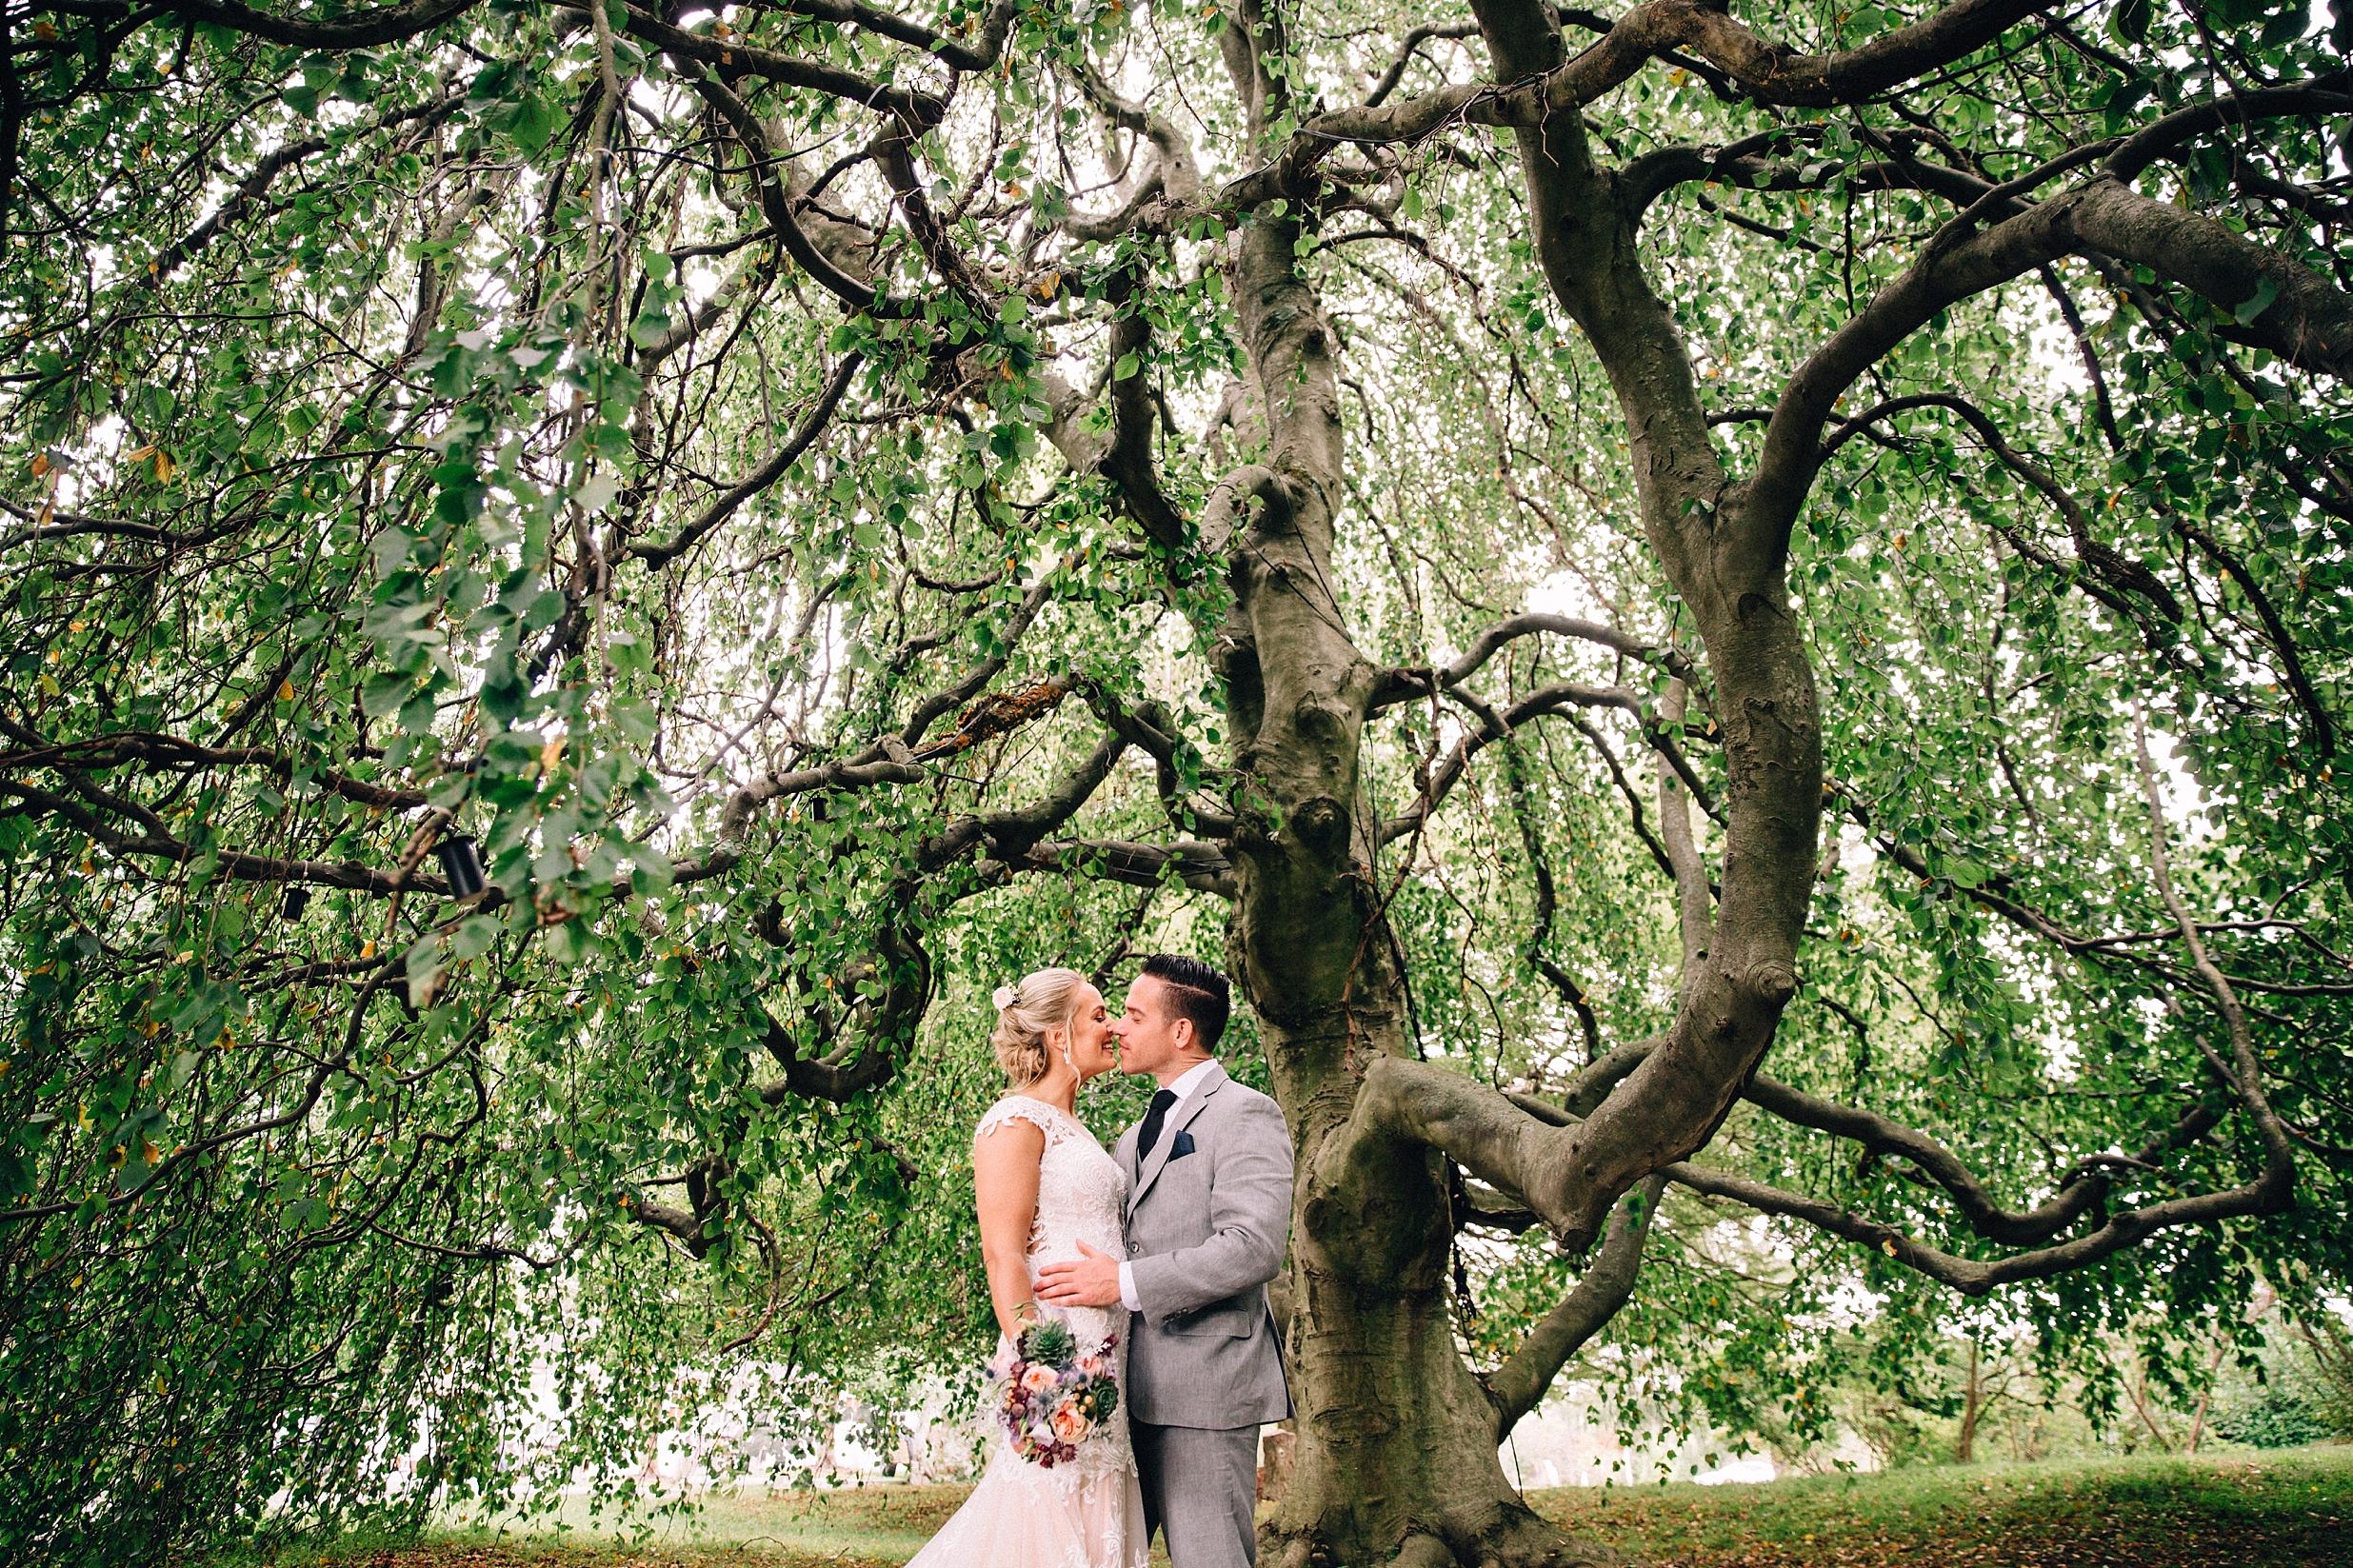 crossed-keys-outdoor-ceremony-camp-wedding-photo_0022.jpg